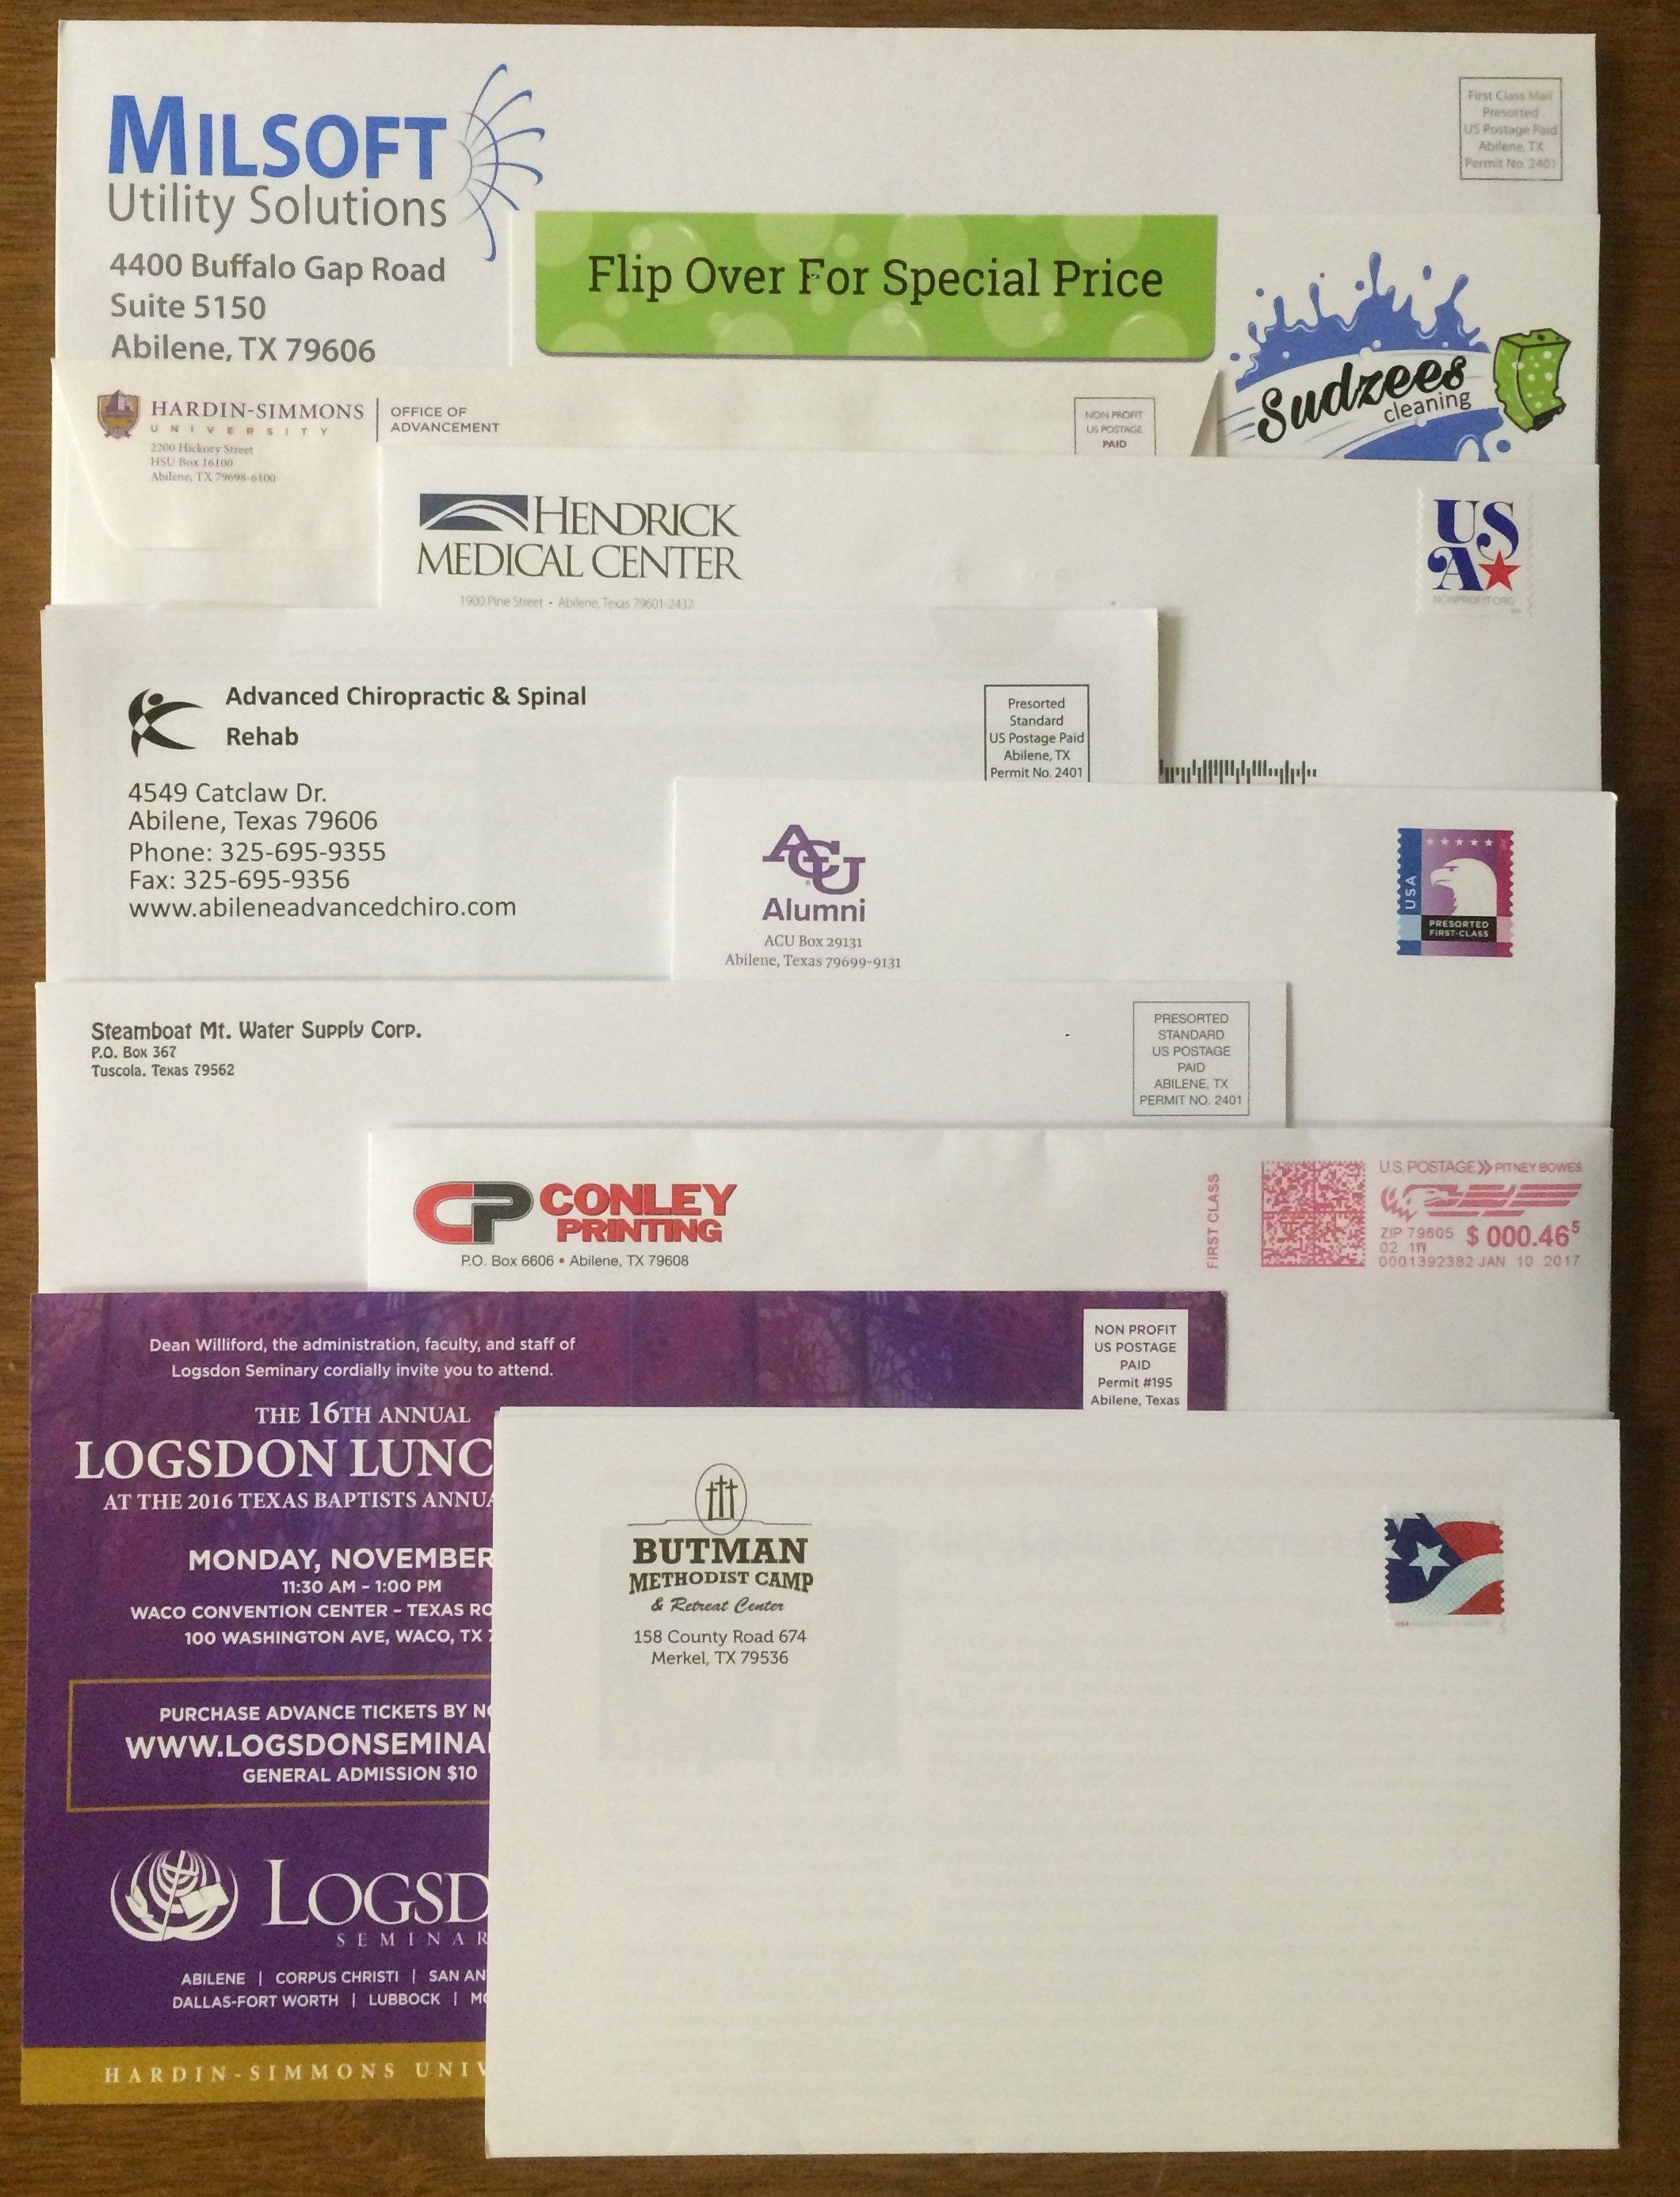 Direct Mail Abilene, TX